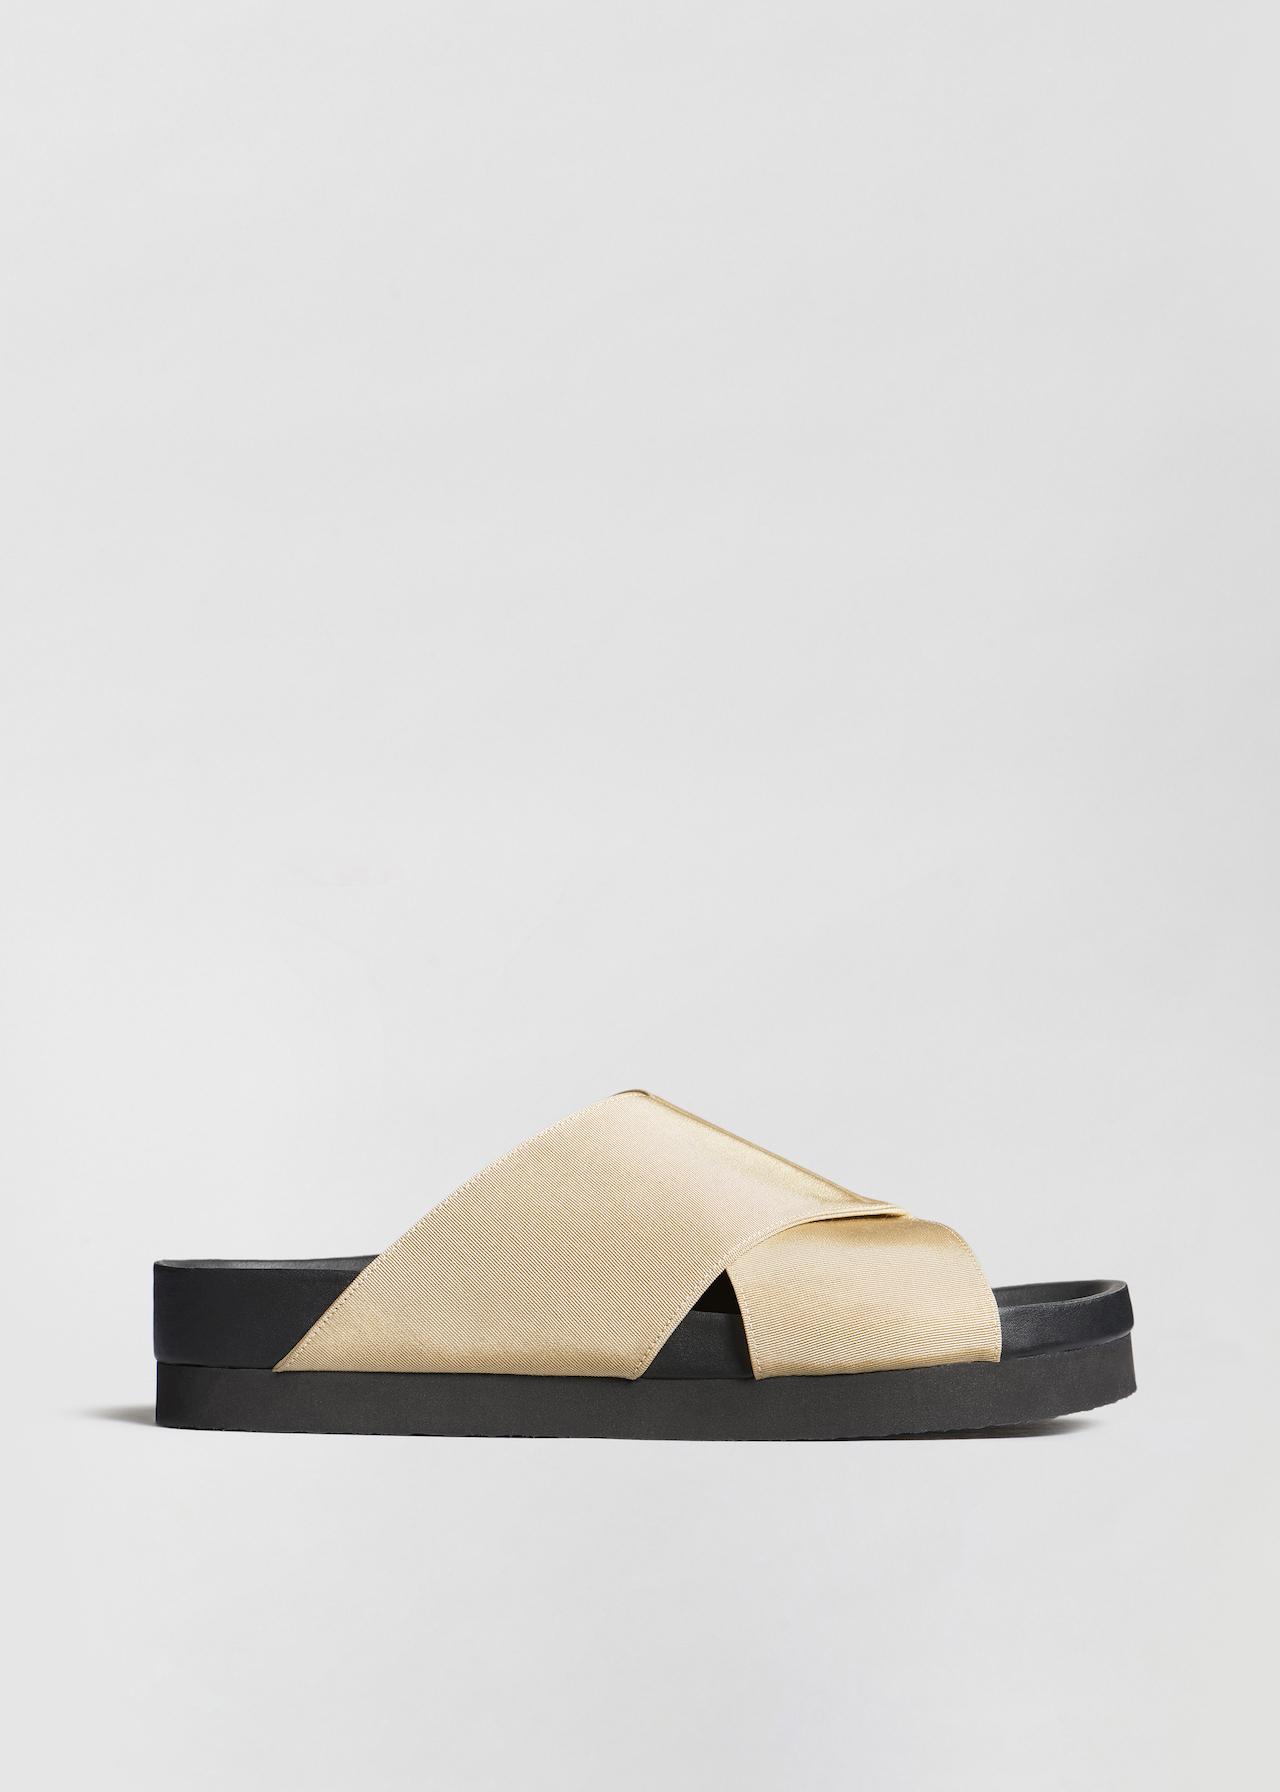 Slide Sandal in Grosgrain - Sand - Co Collections